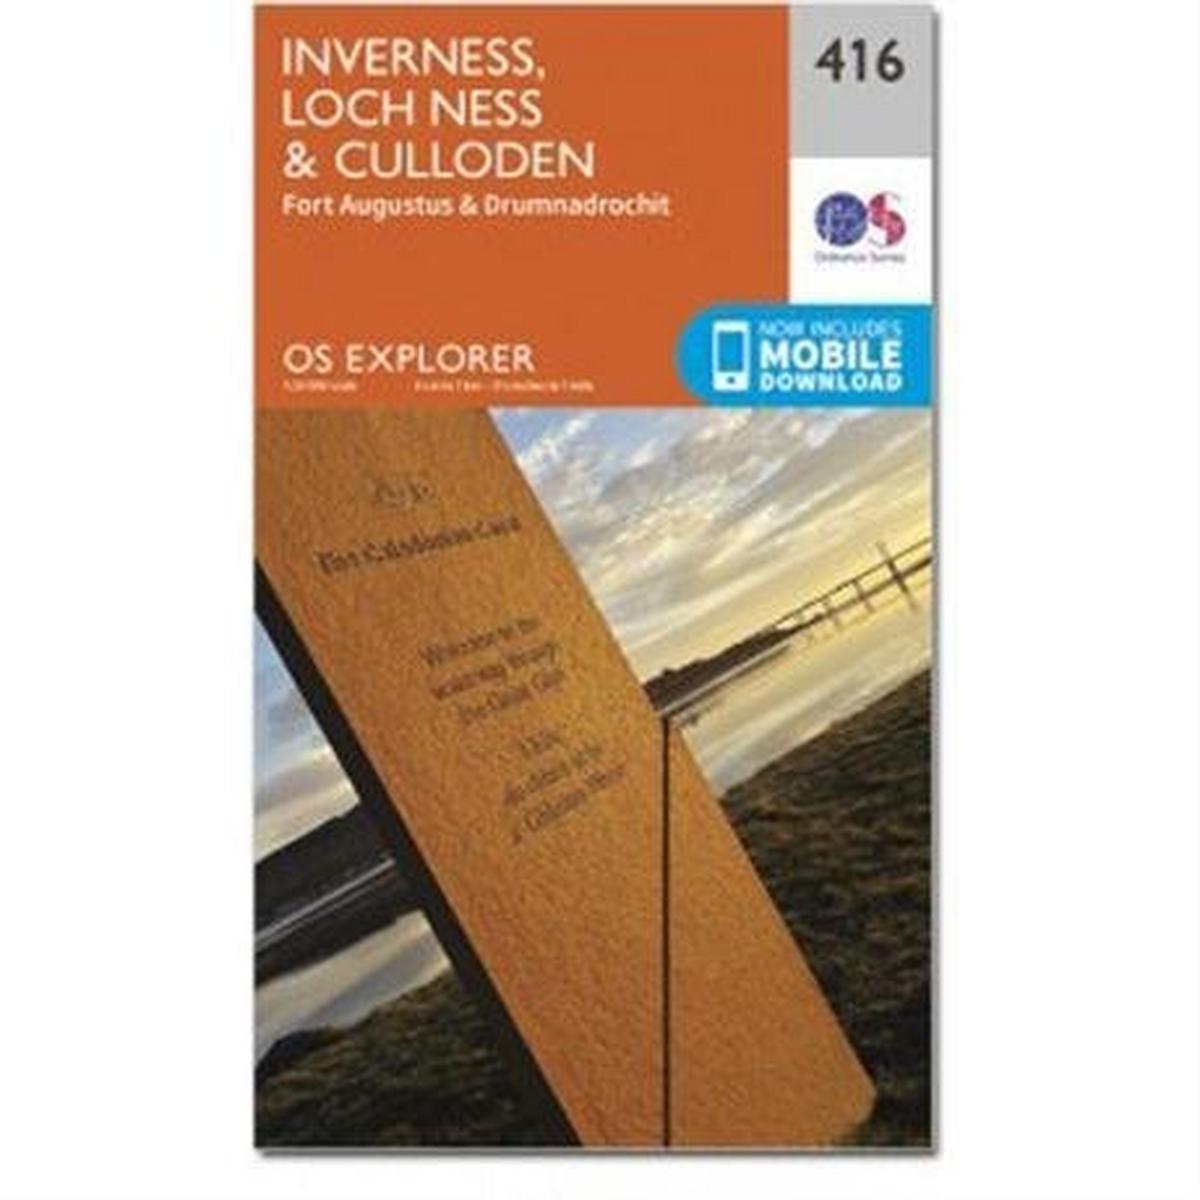 Ordnance Survey OS Explorer Map OL416 Inverness, Loch Ness & Culloden